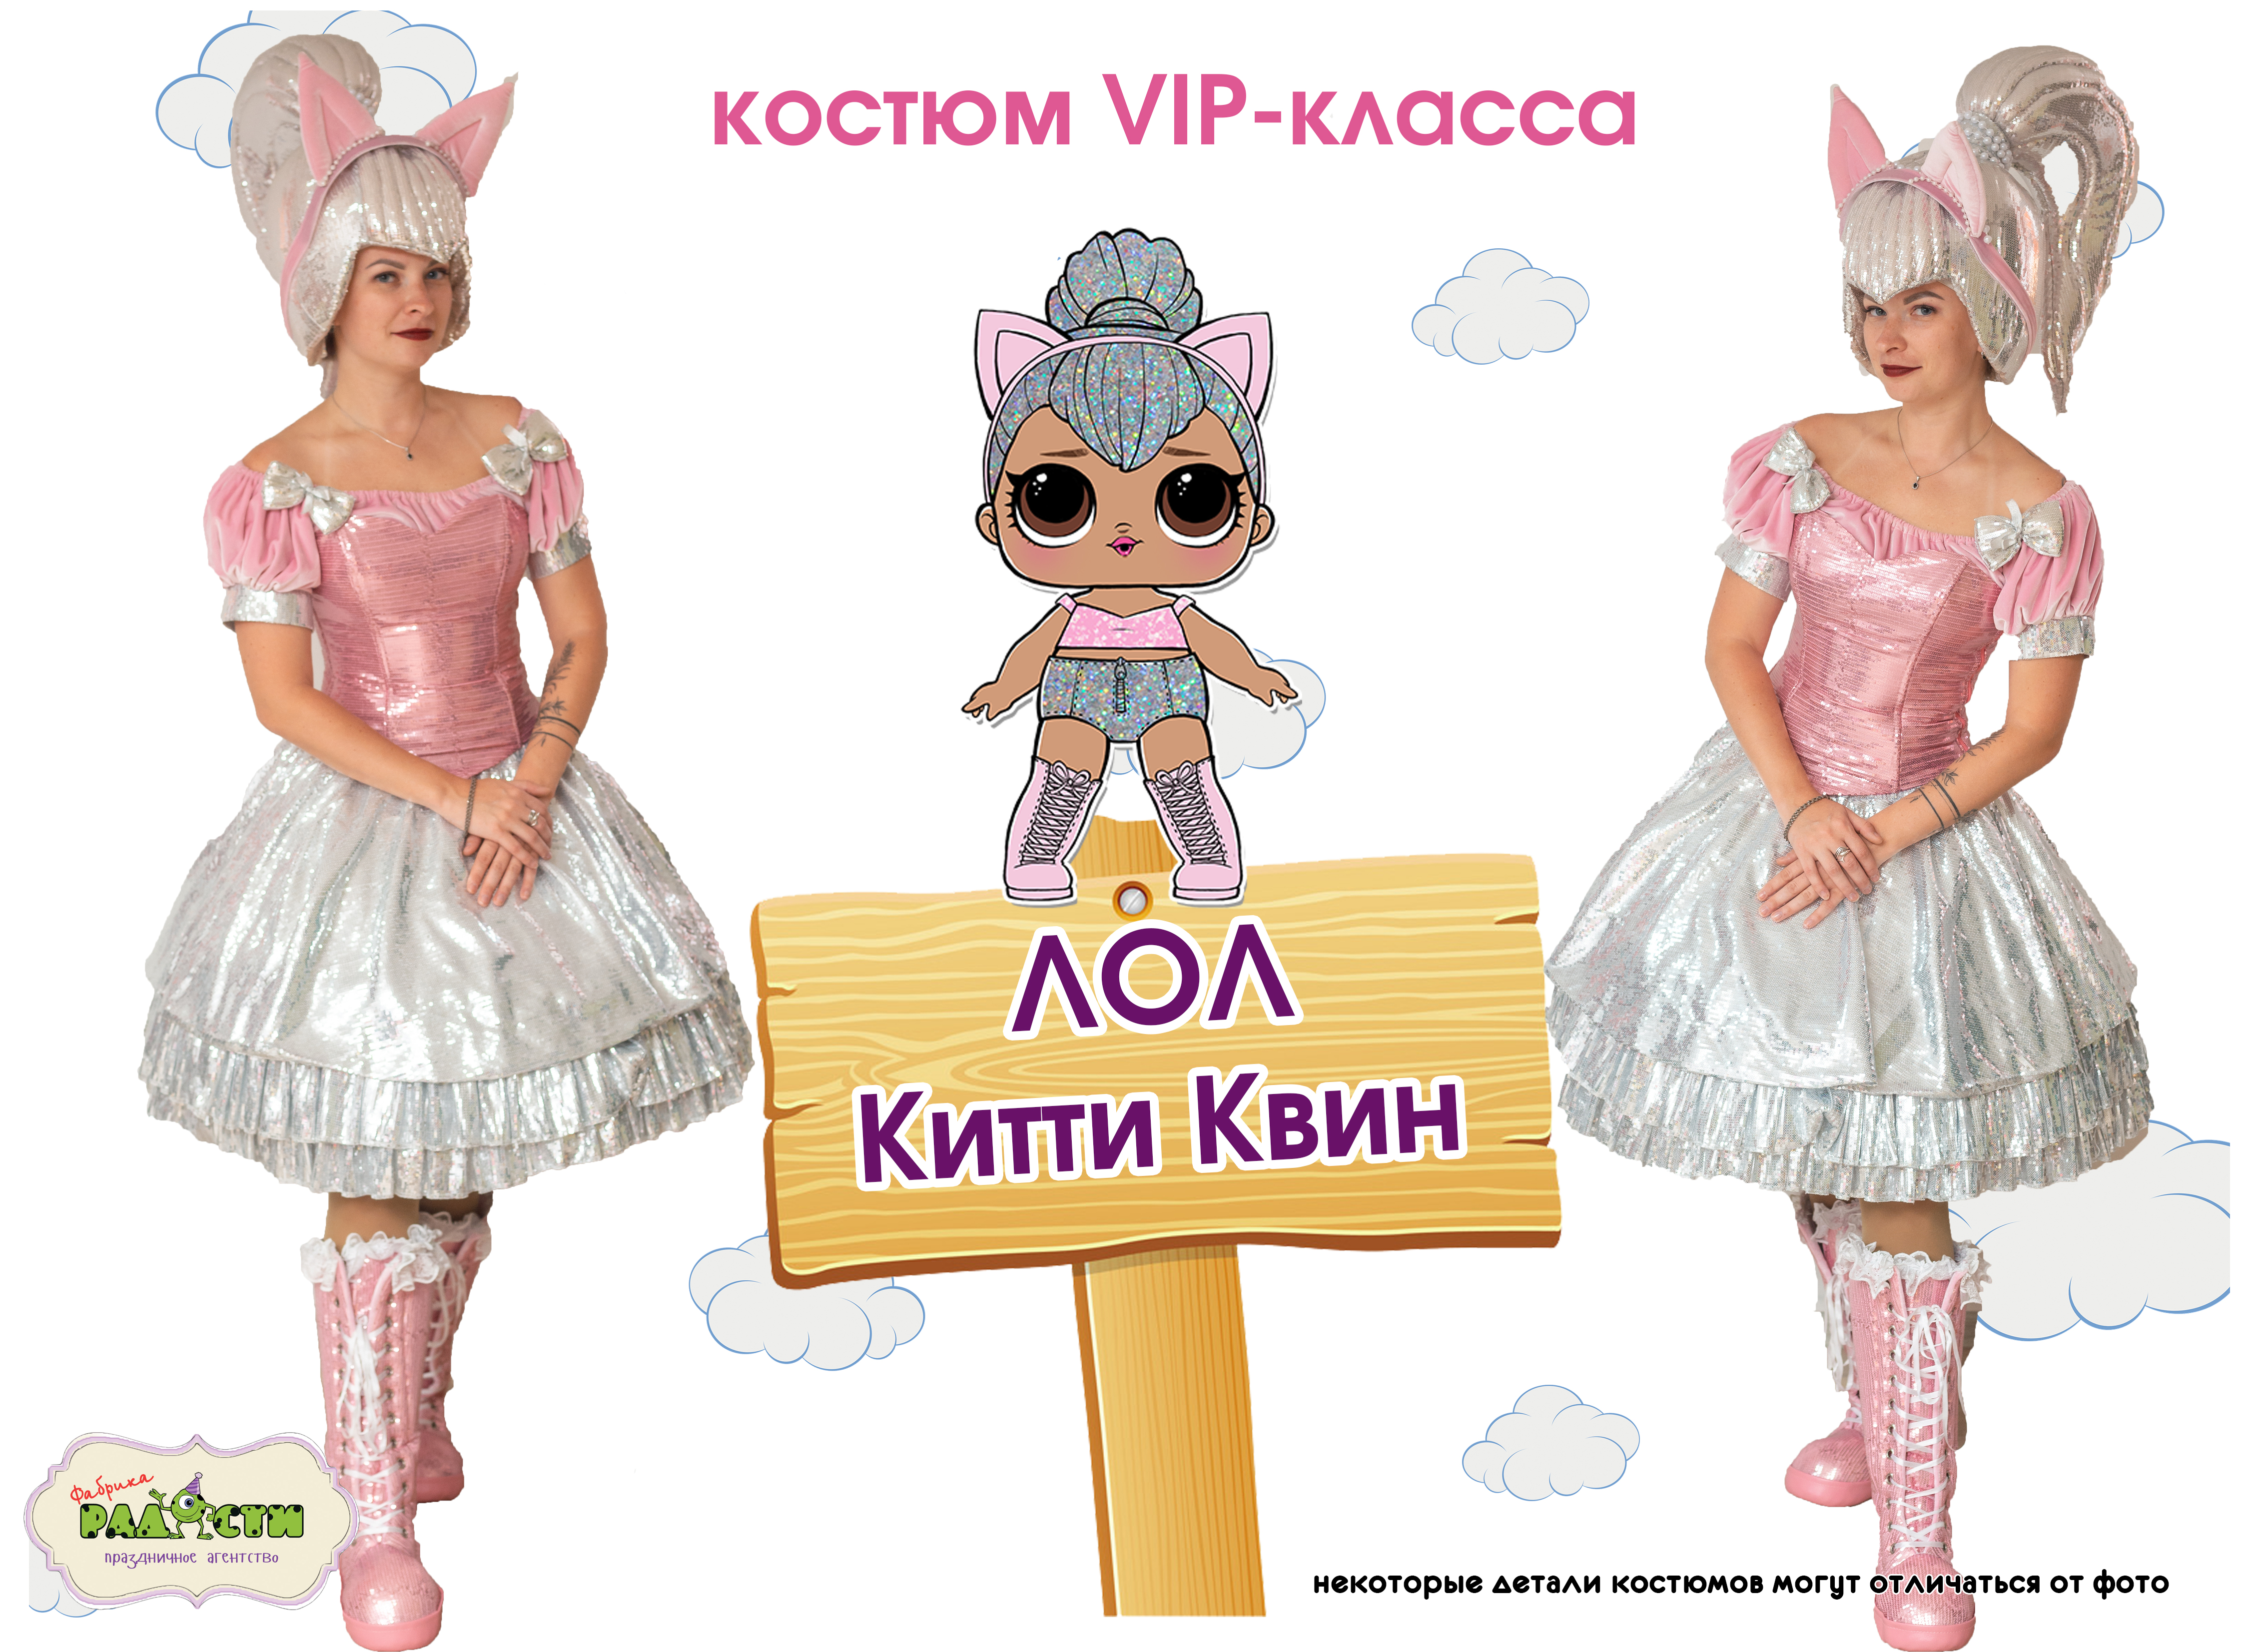 ЛОЛ Китти Квин